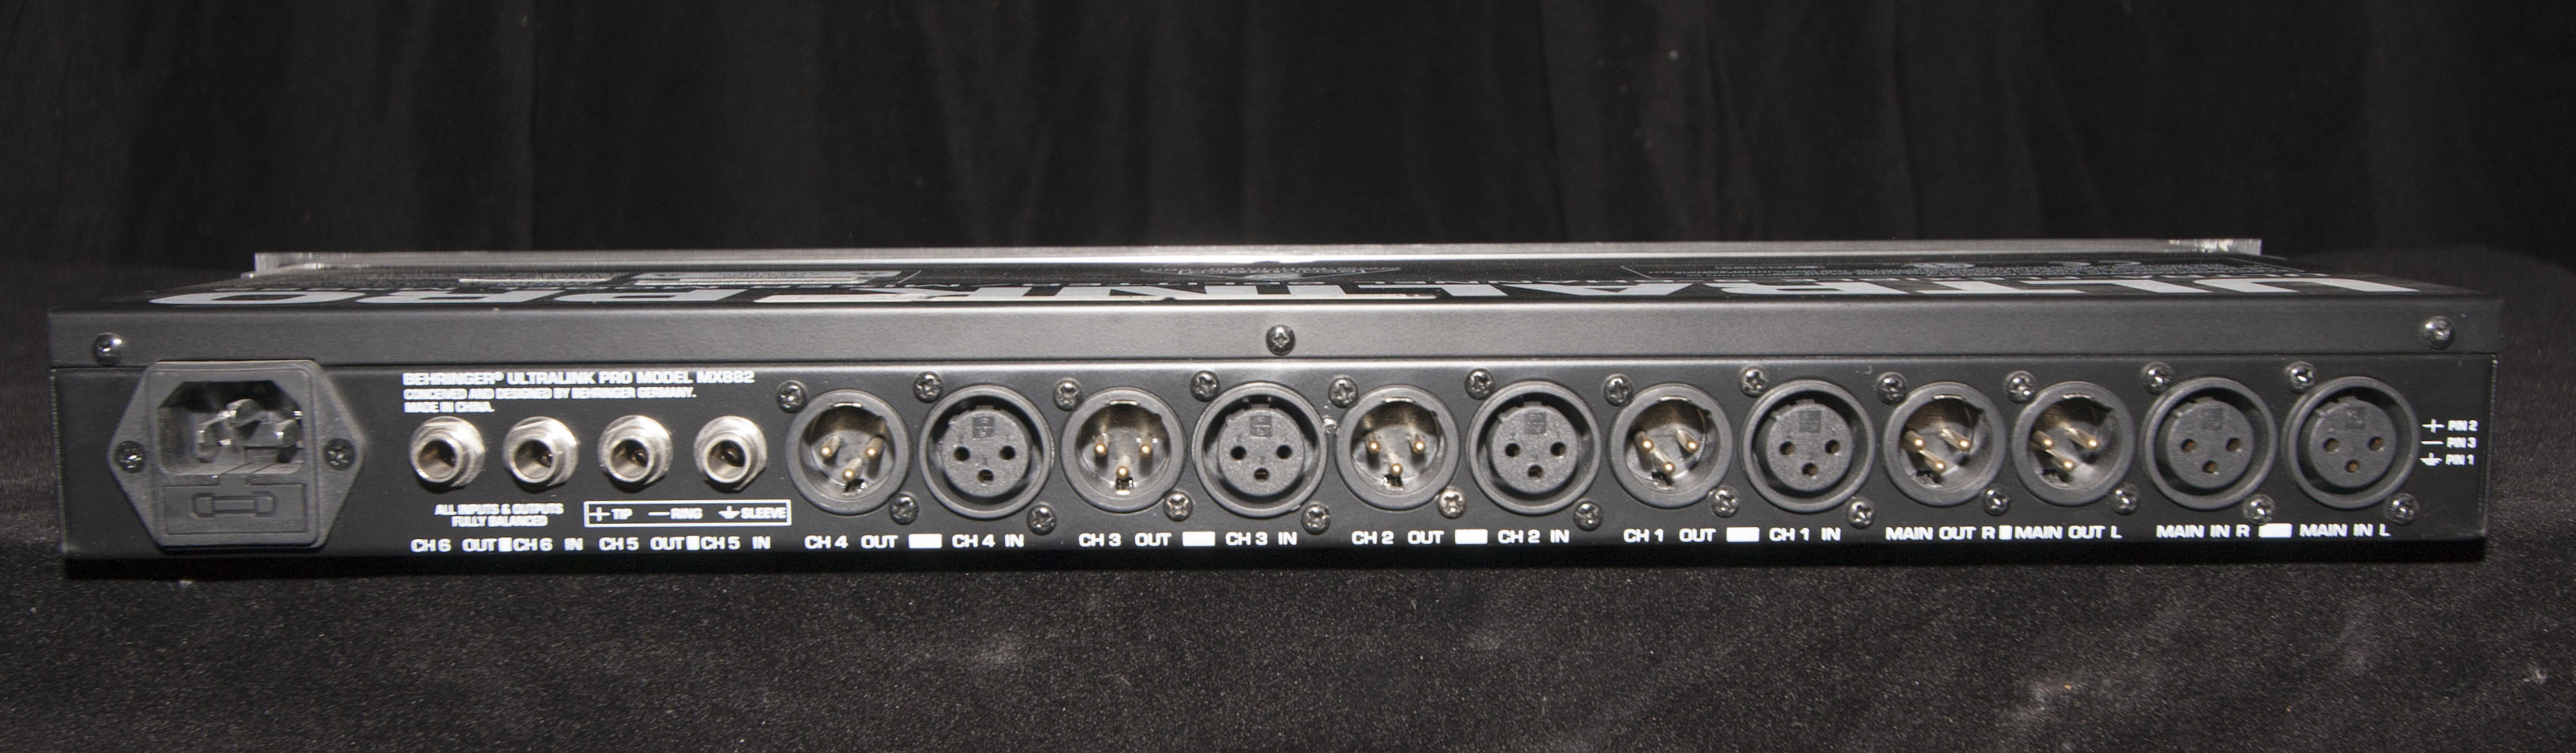 Behringer MX882 Ultralink Pro